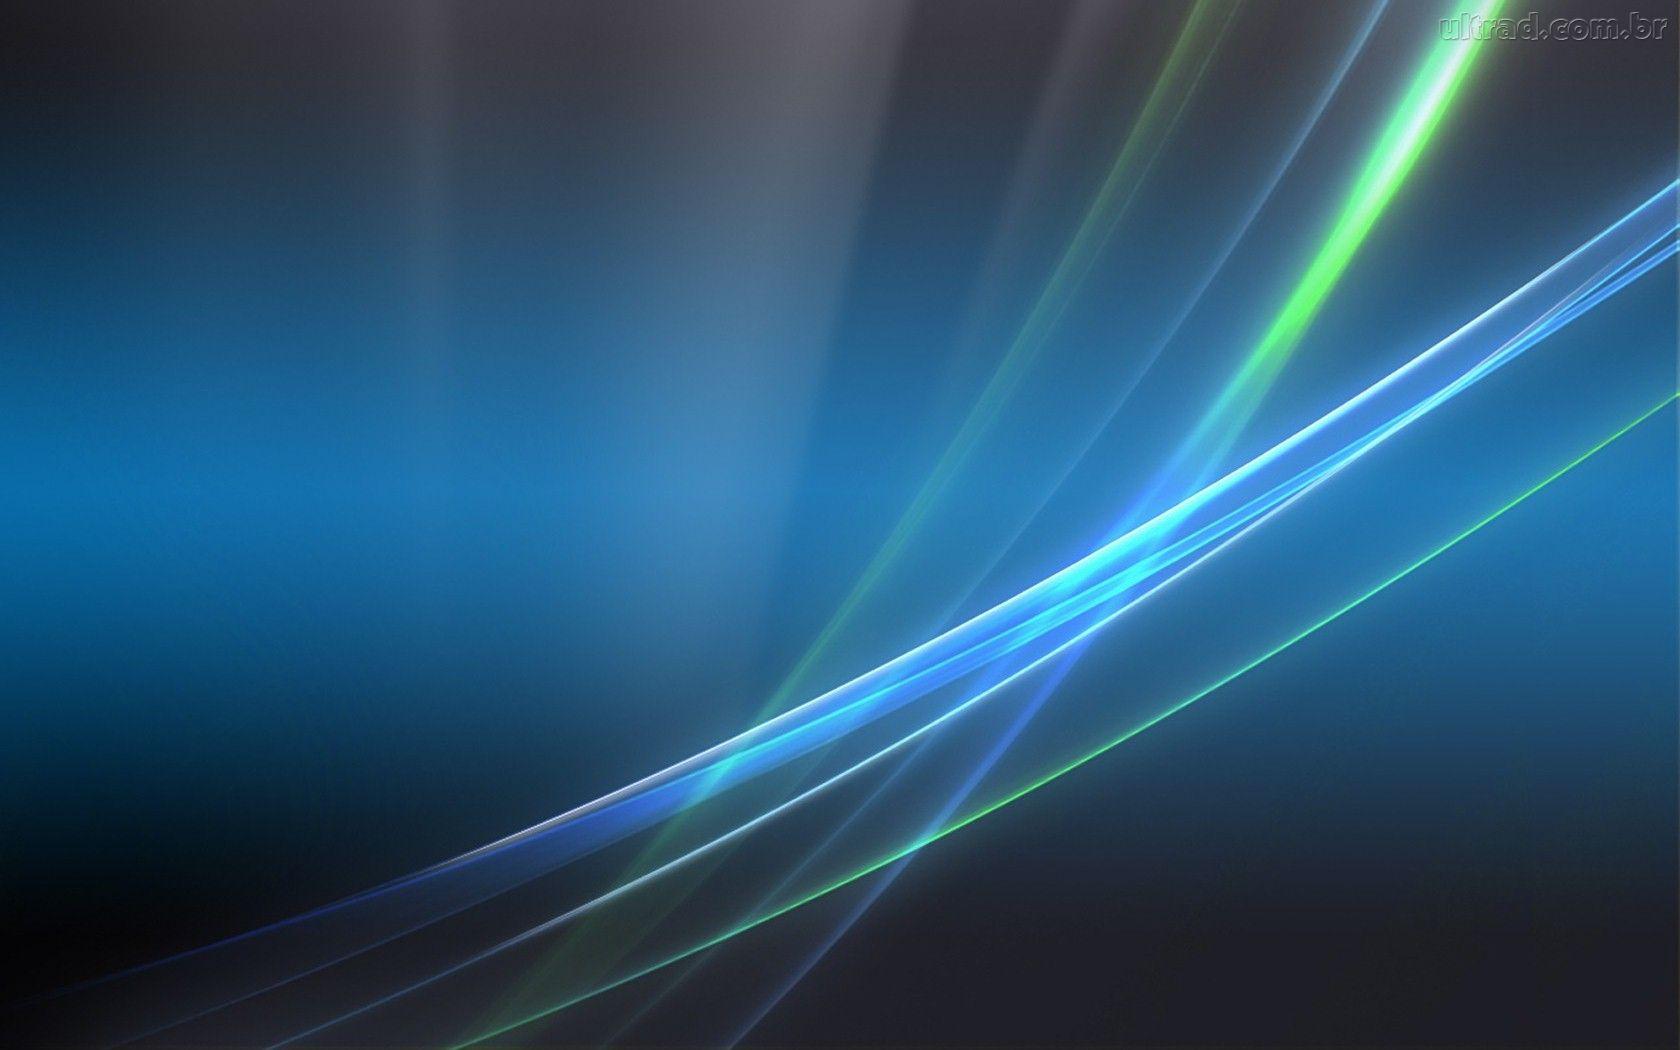 Windows Vista Ultimate Wallpaper